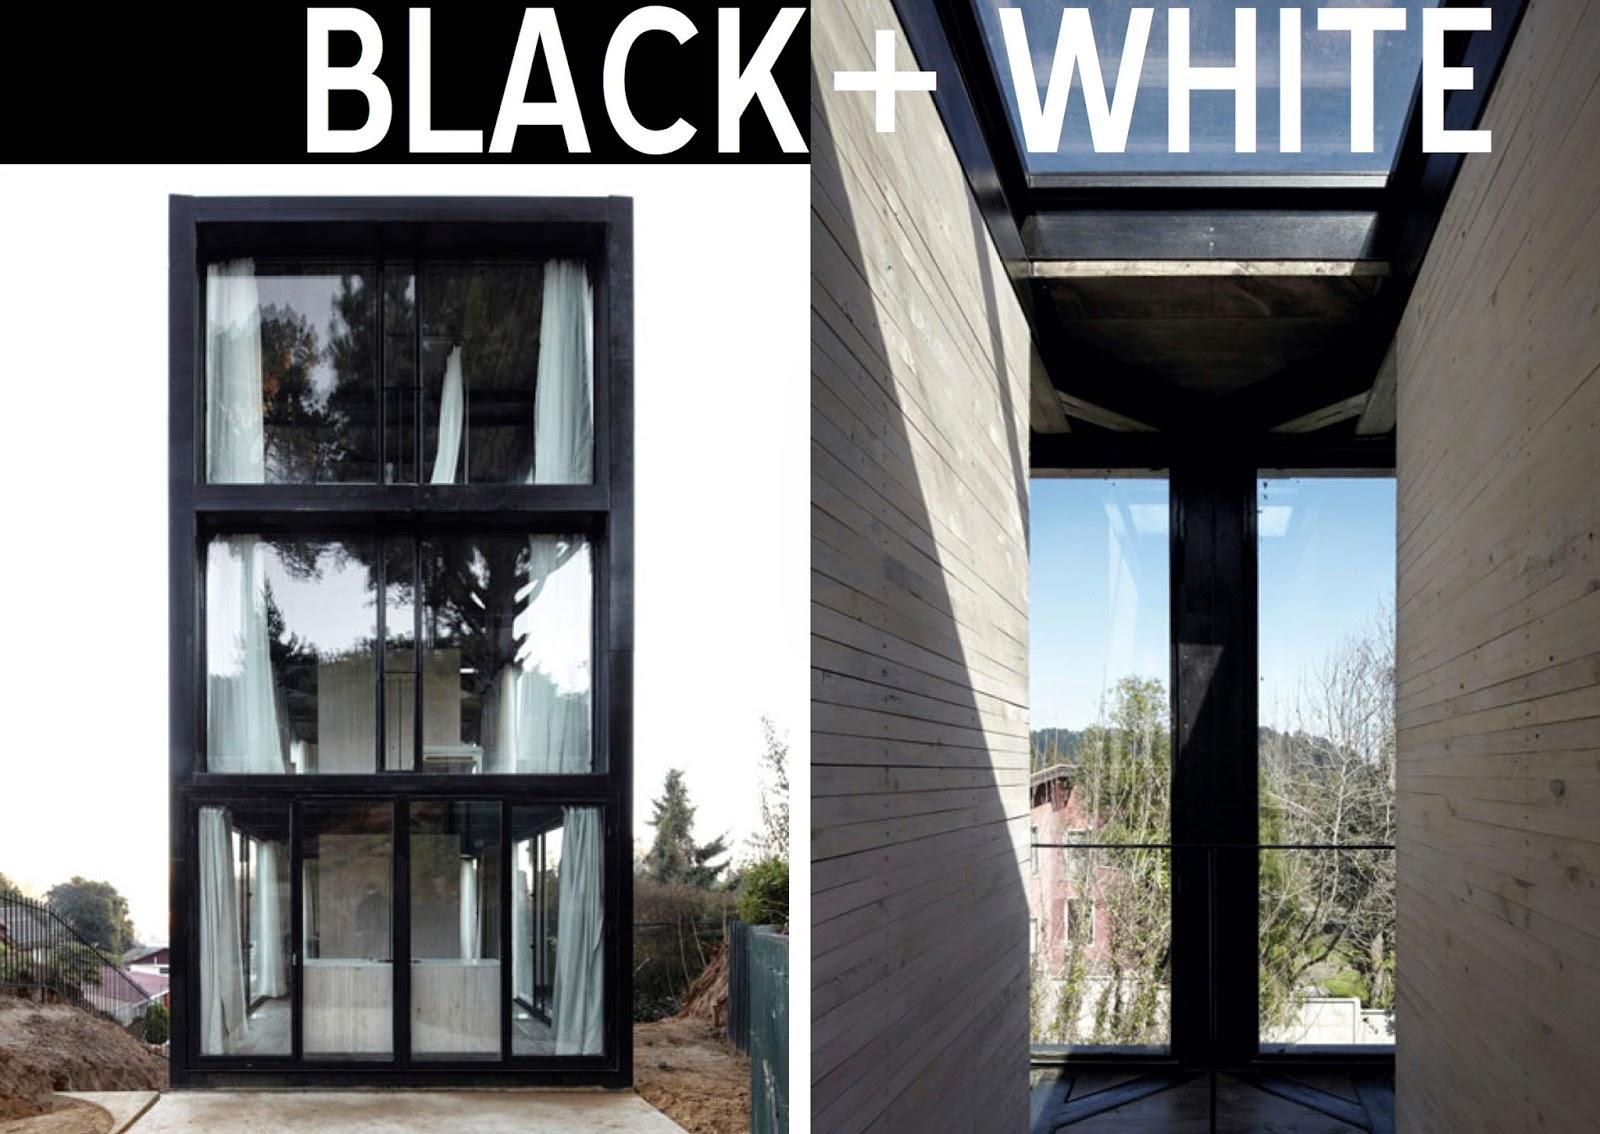 Casa Arco | Pezo von Ellrichshausen | Black + White Wednesdays